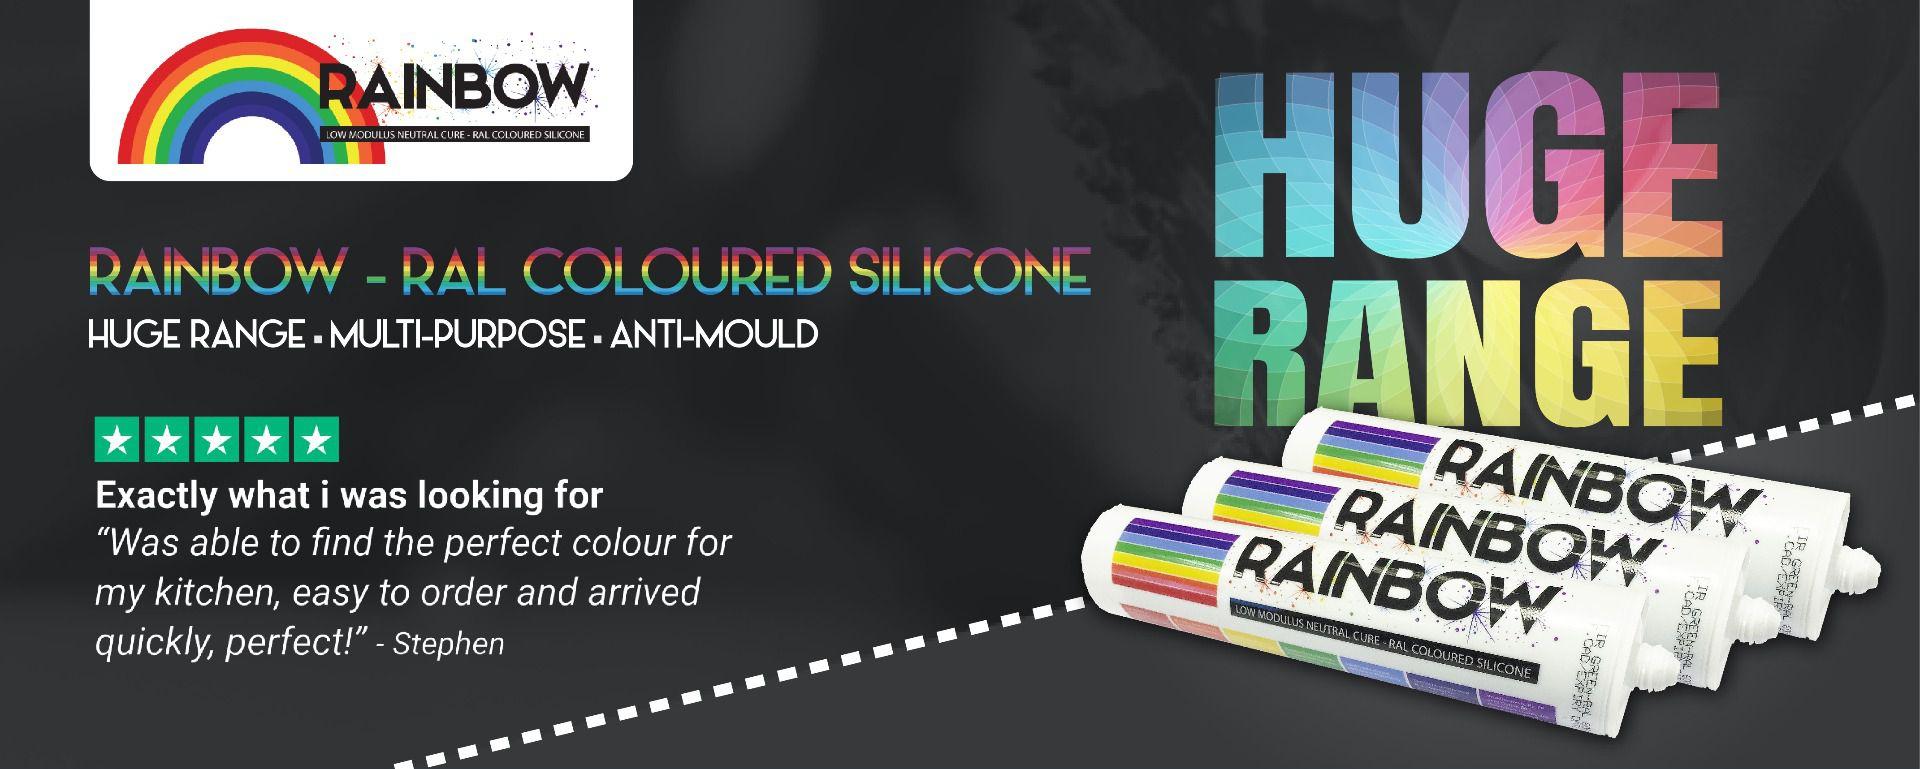 Rainbow Homepage